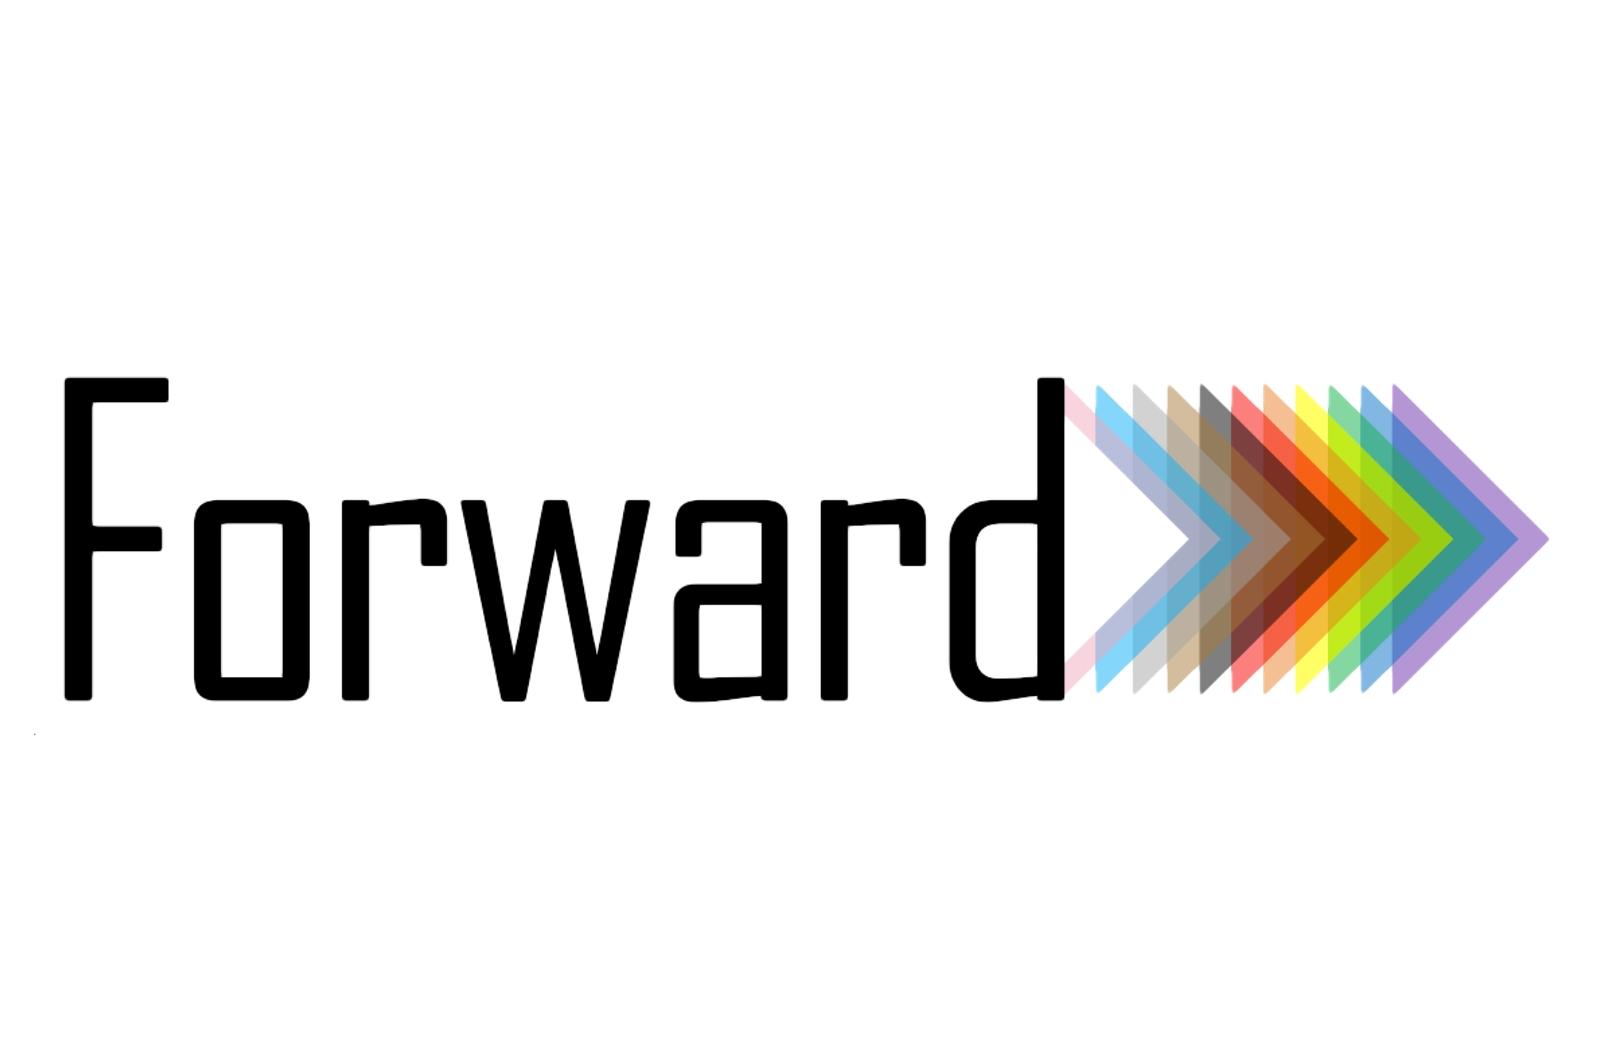 Forward_Chevron_Hero_Image